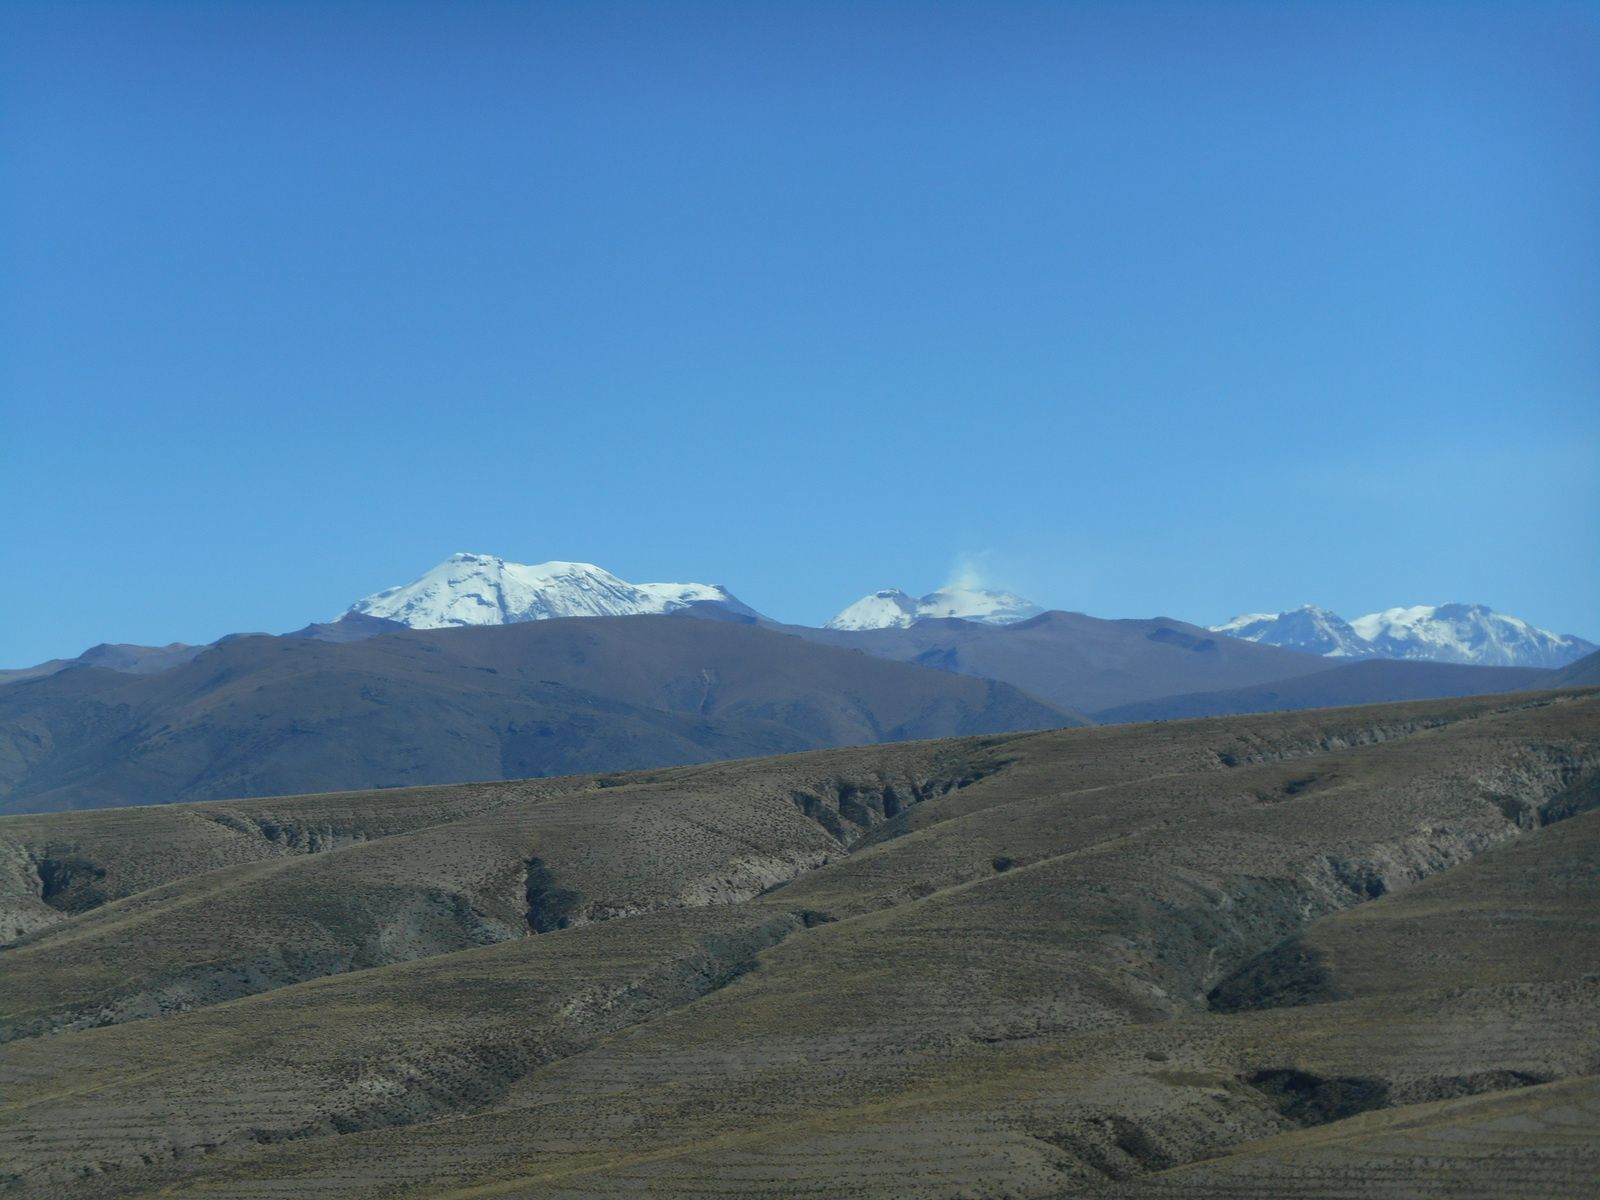 Les nombreux volcans: Ampato, Sabancaya, Hualca...